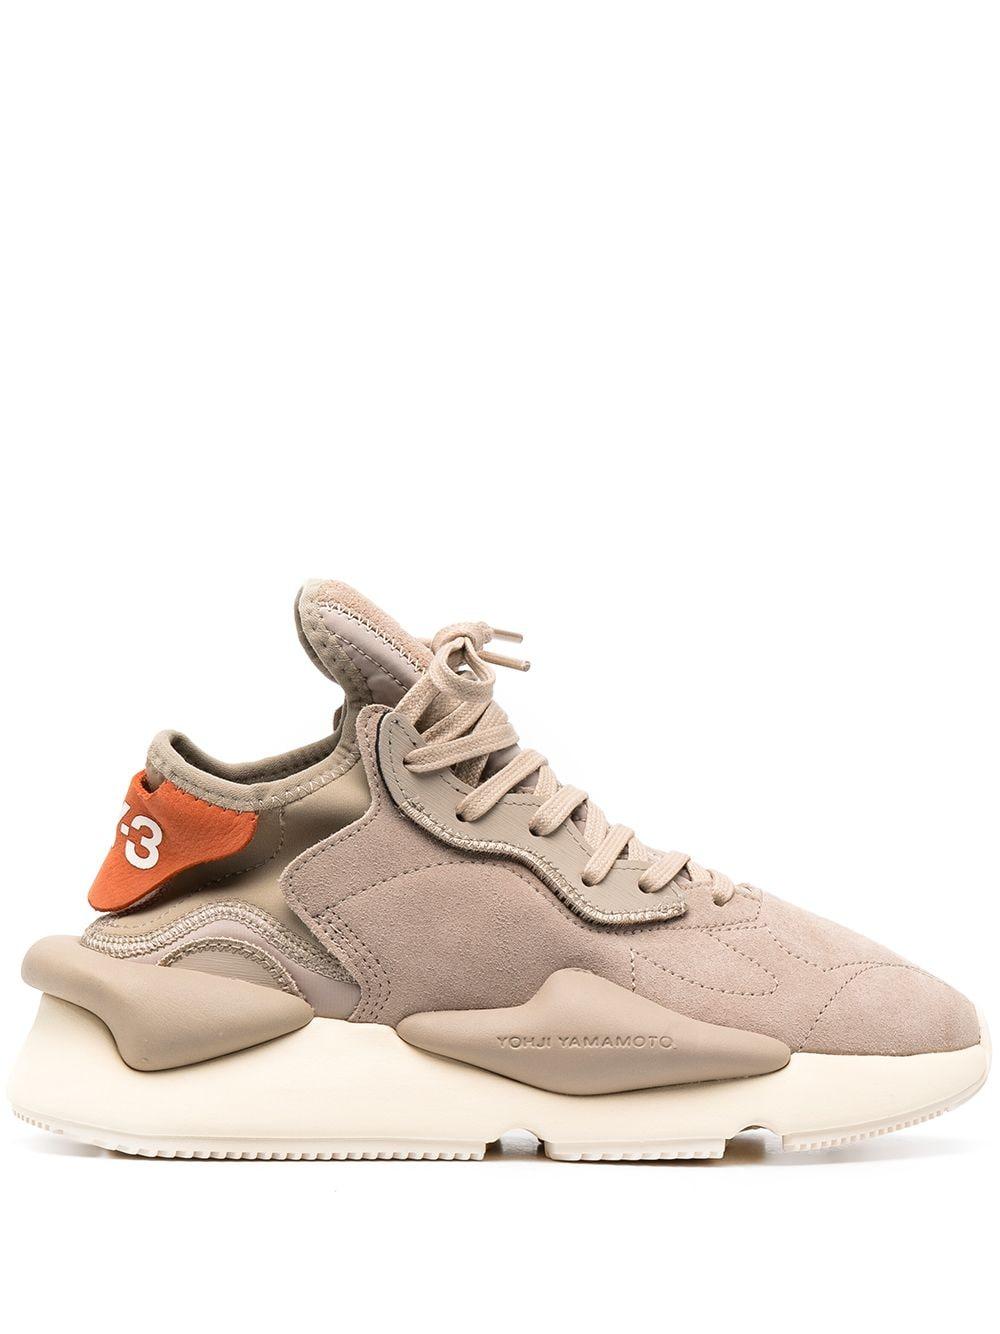 Kaiwa Leather Sneakers